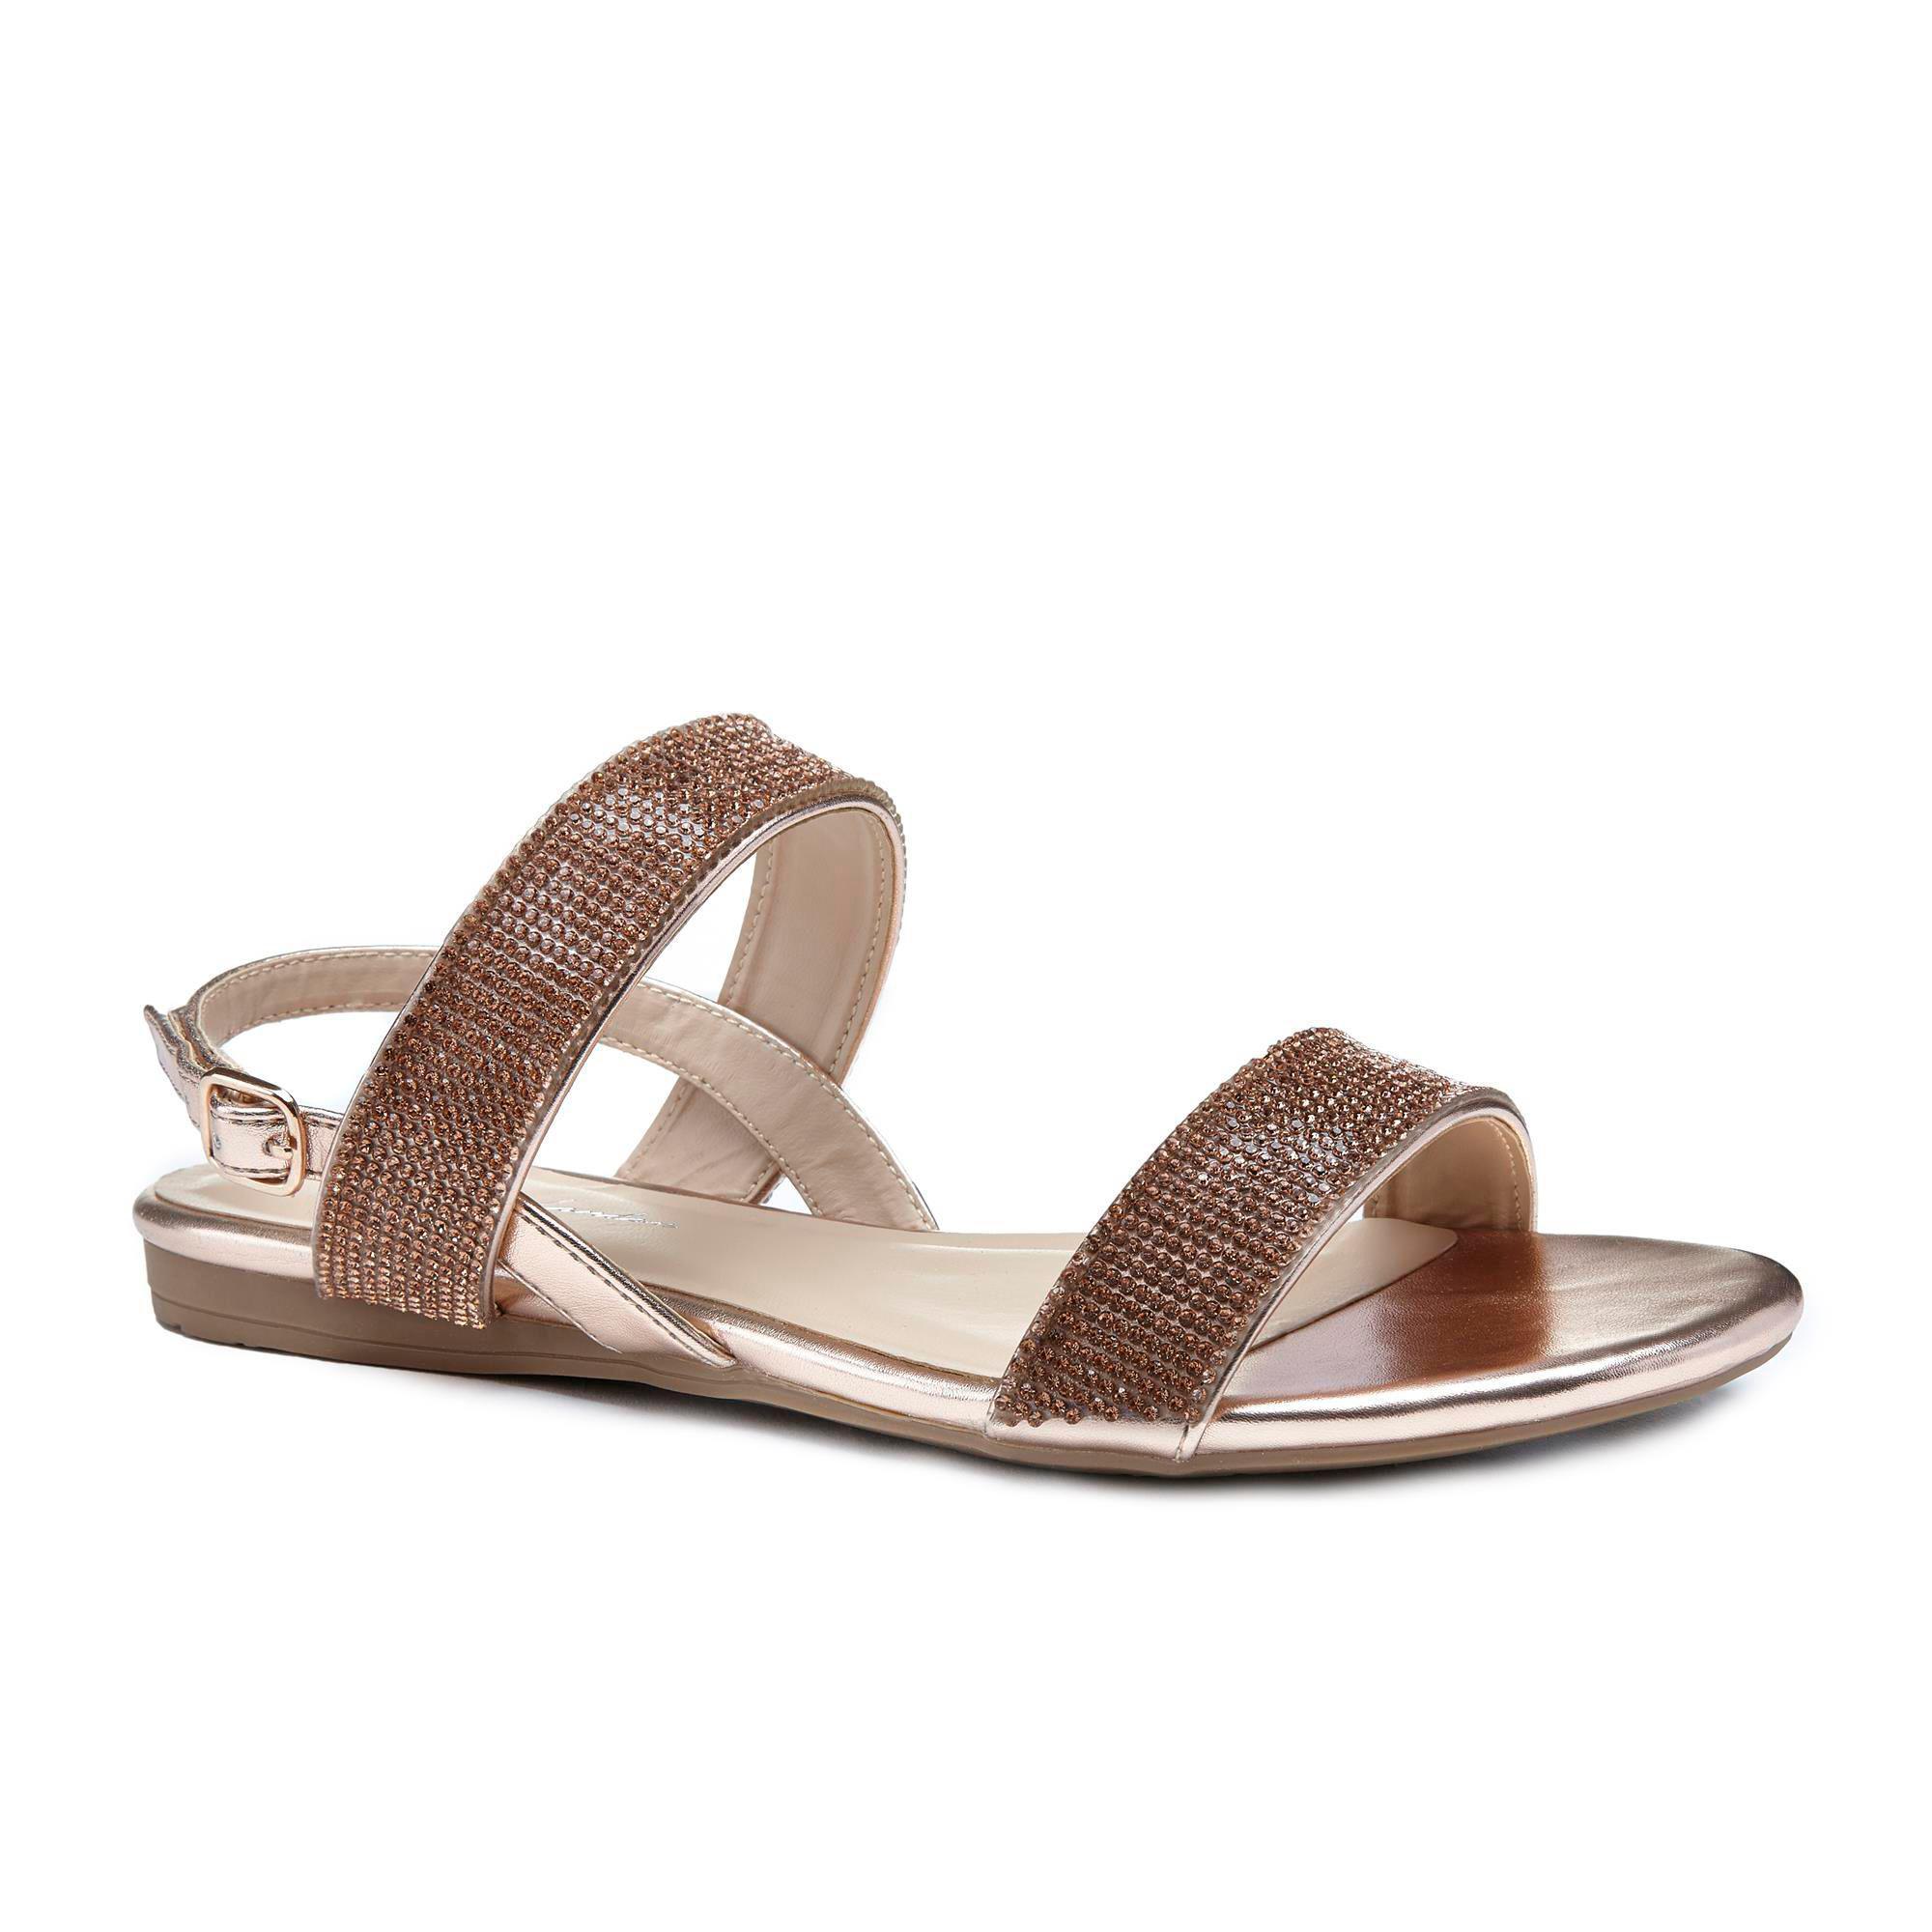 Paradox London Pink NIRVANA - Sandals - silver metalic oE1SKqK